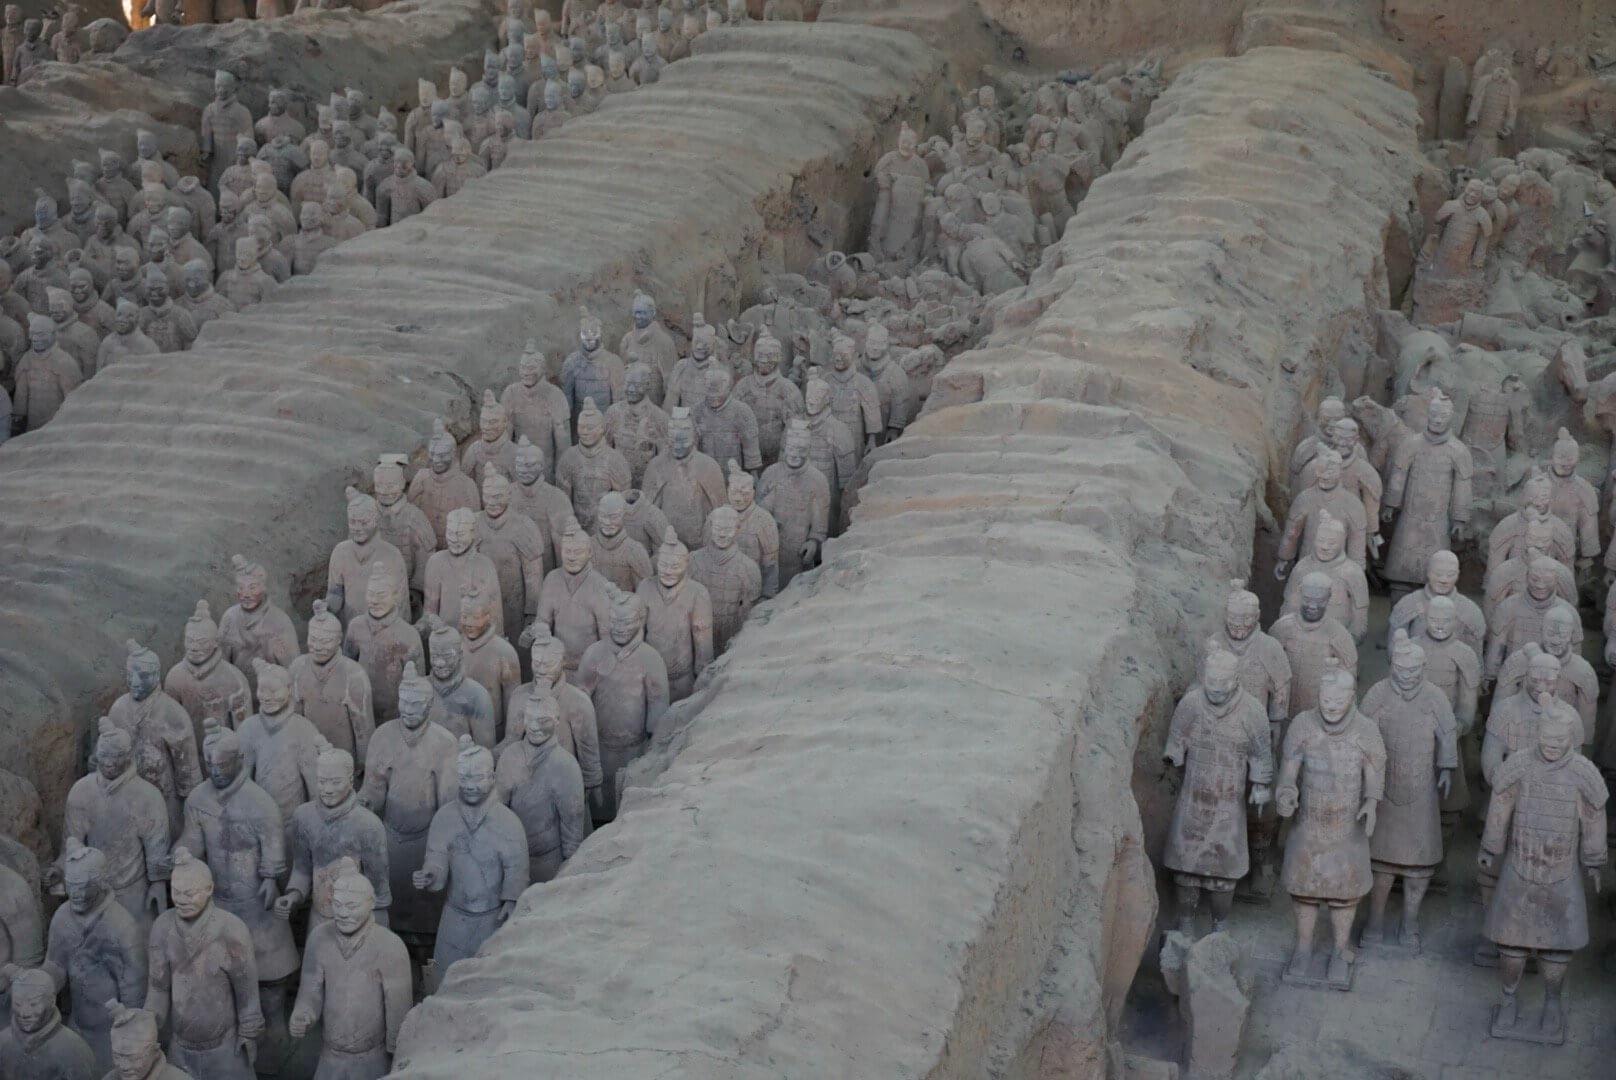 Armée de soldats en terre cuite de Xian chine